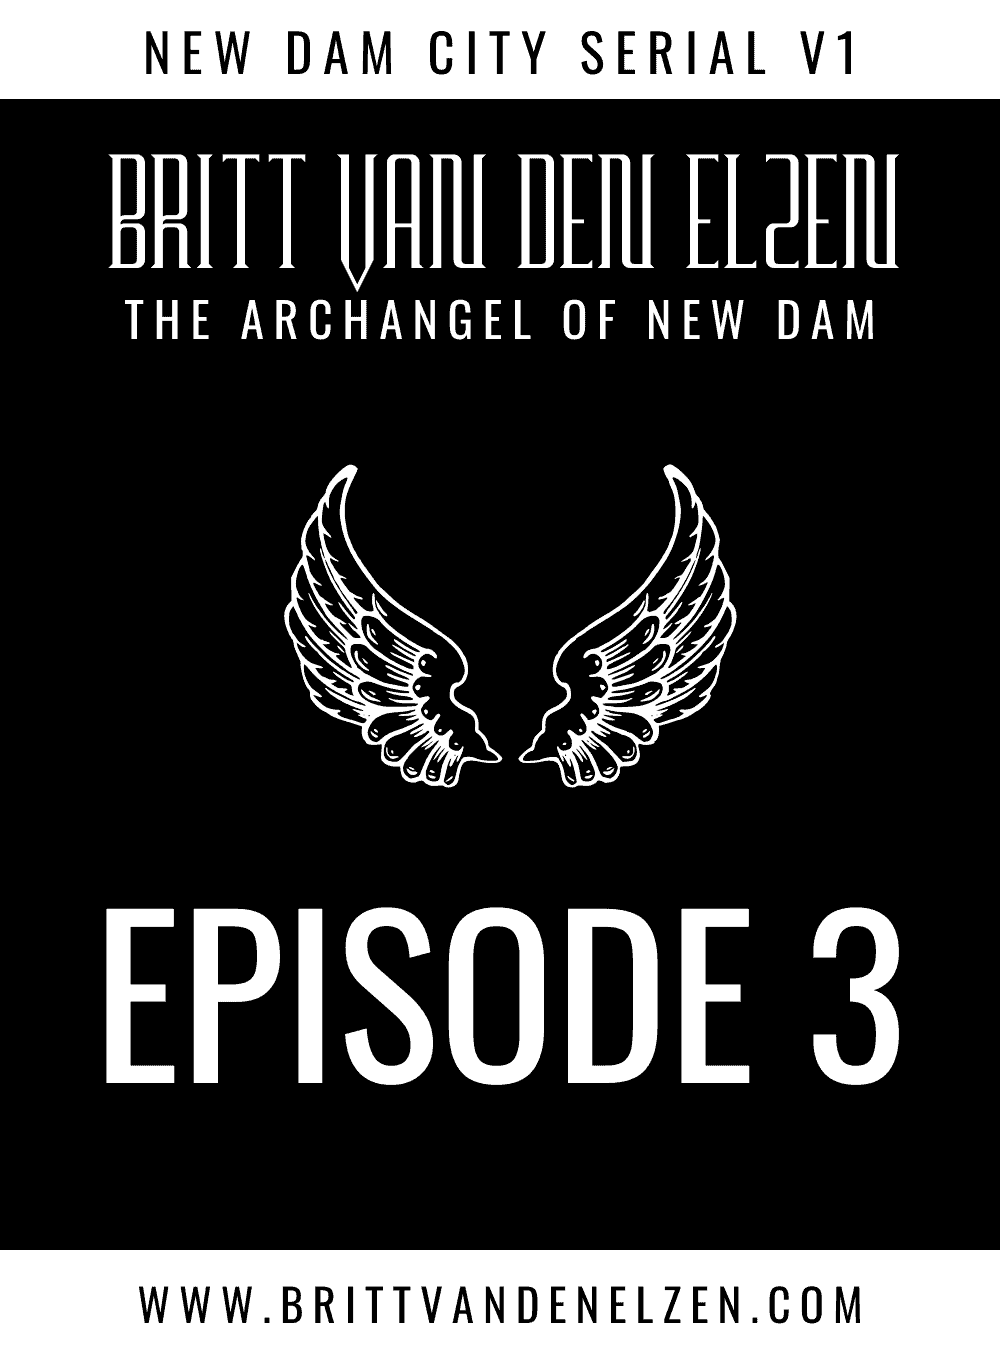 The Archangel of New Dam: Episode 3